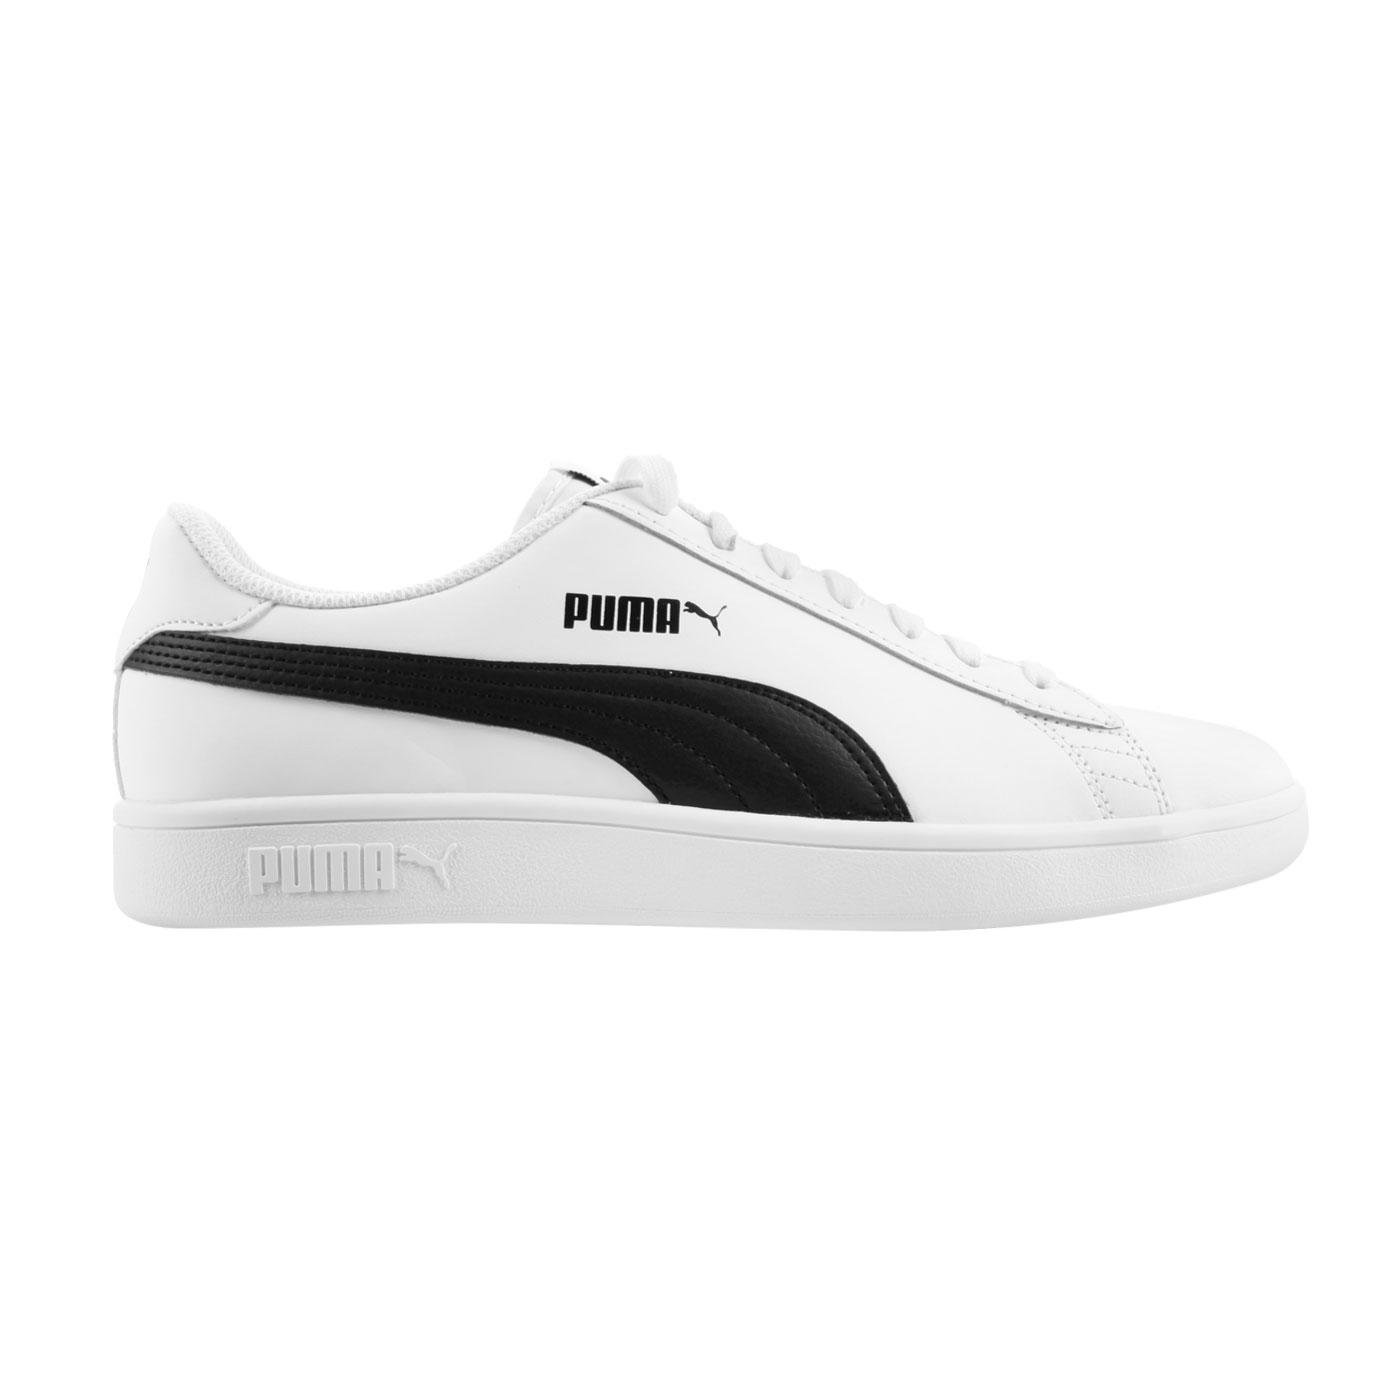 PUMA 男款休閒運動鞋  @Smash v2 L@36521501